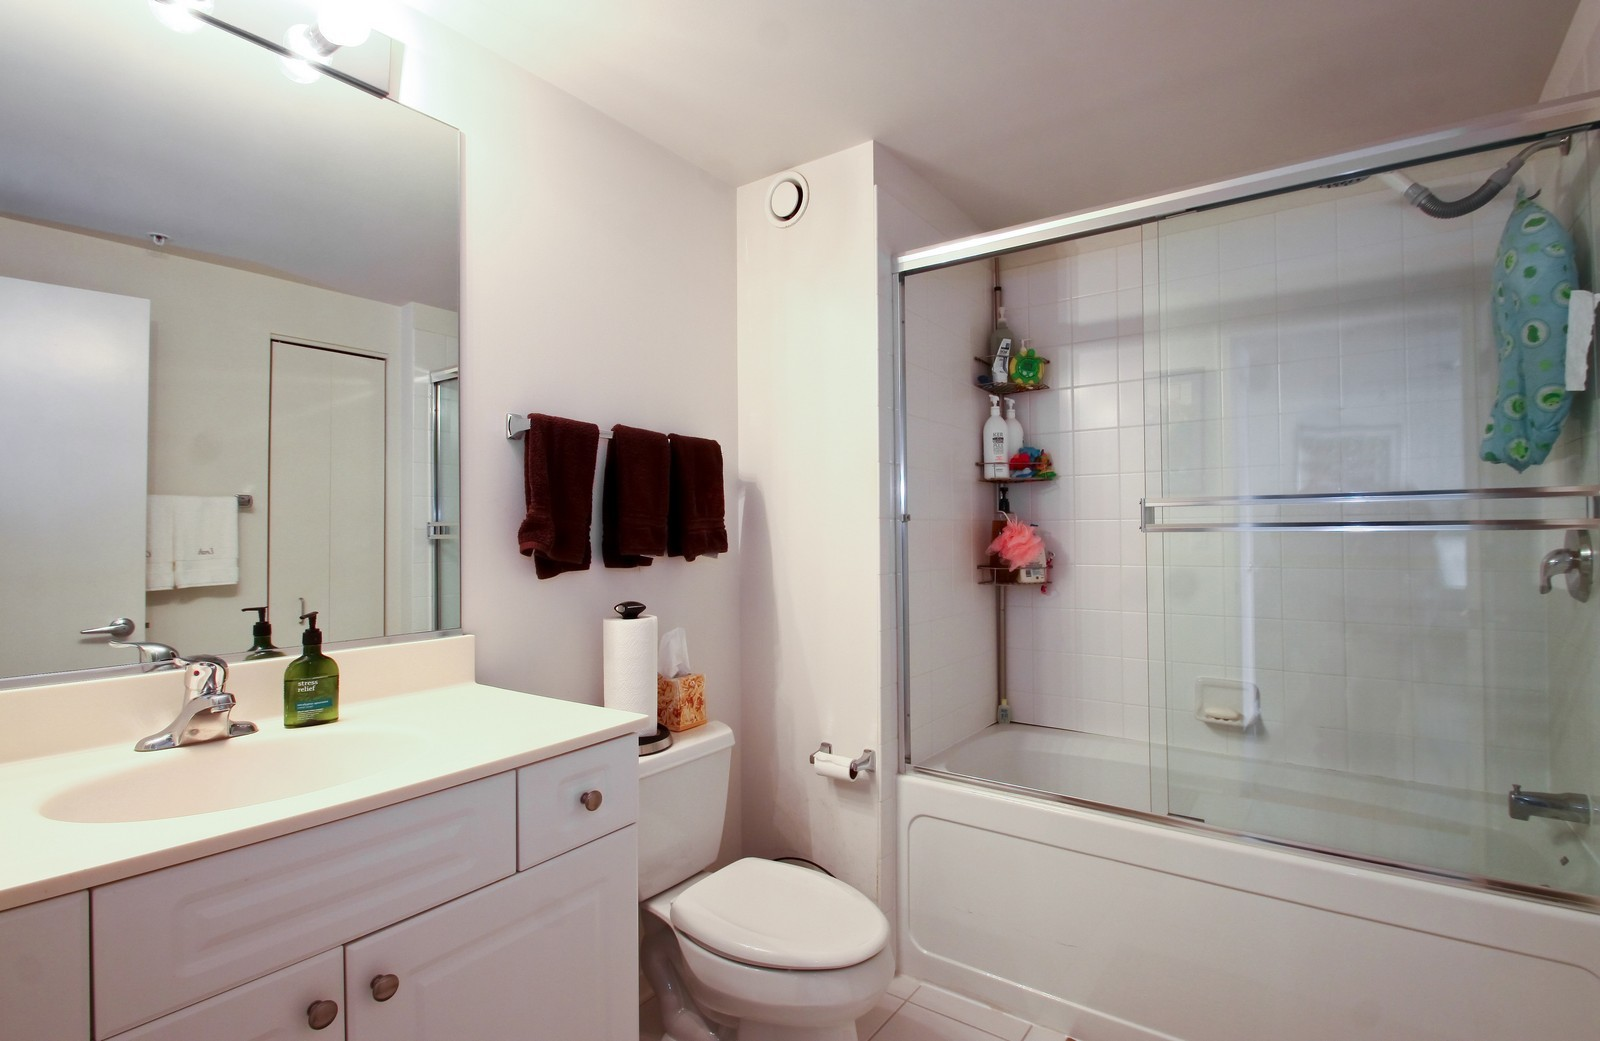 Real Estate Photography - 807 Davis, Evanston, IL, 60201 - Bathroom